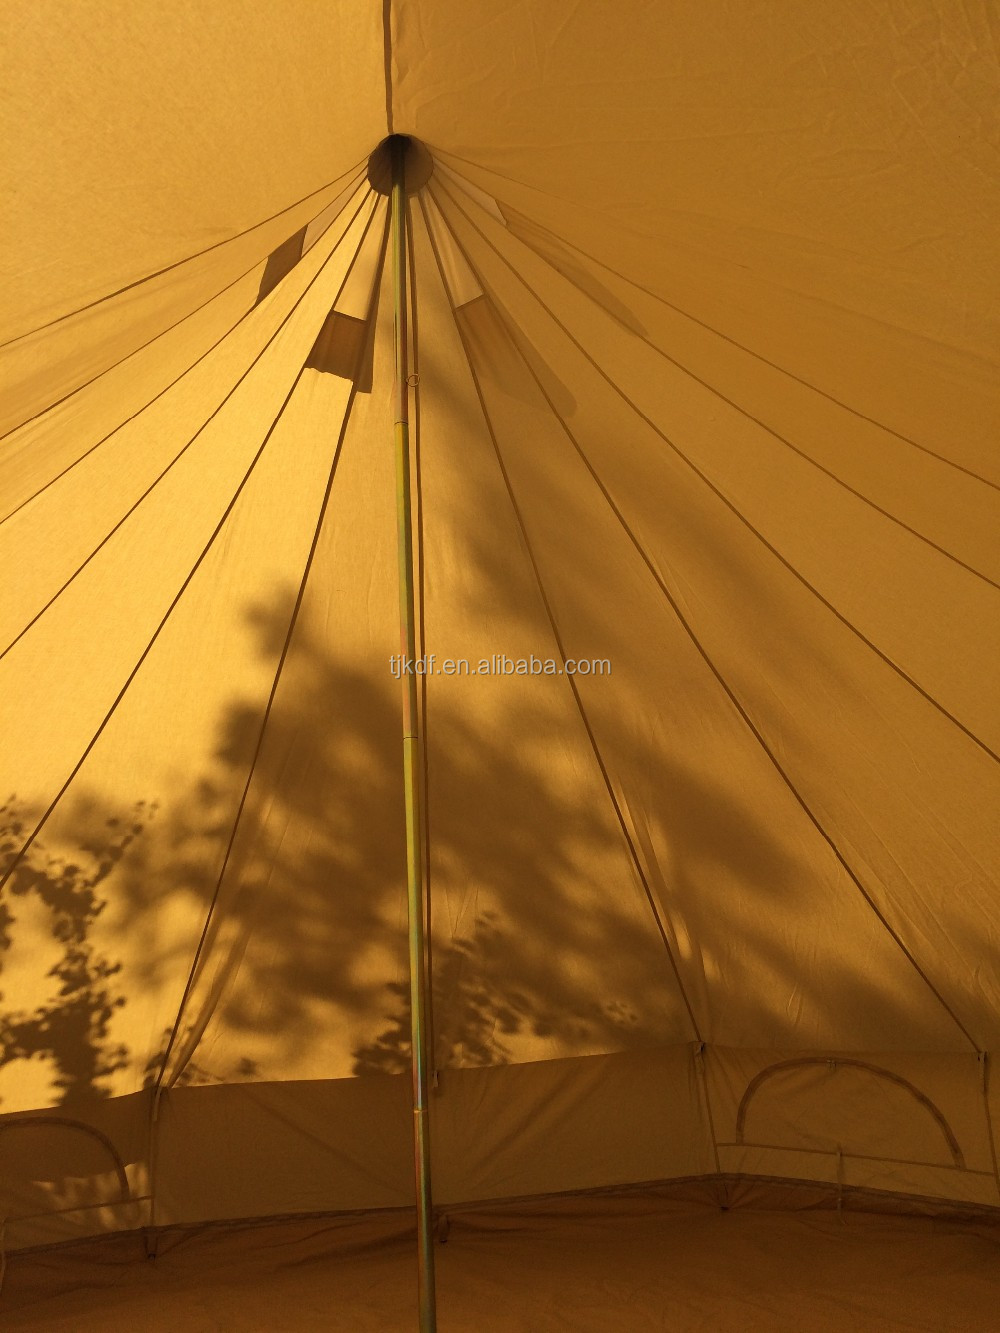 5m Sahara Tent Sibley Uk Cotton Canvas Bell Tent Buy